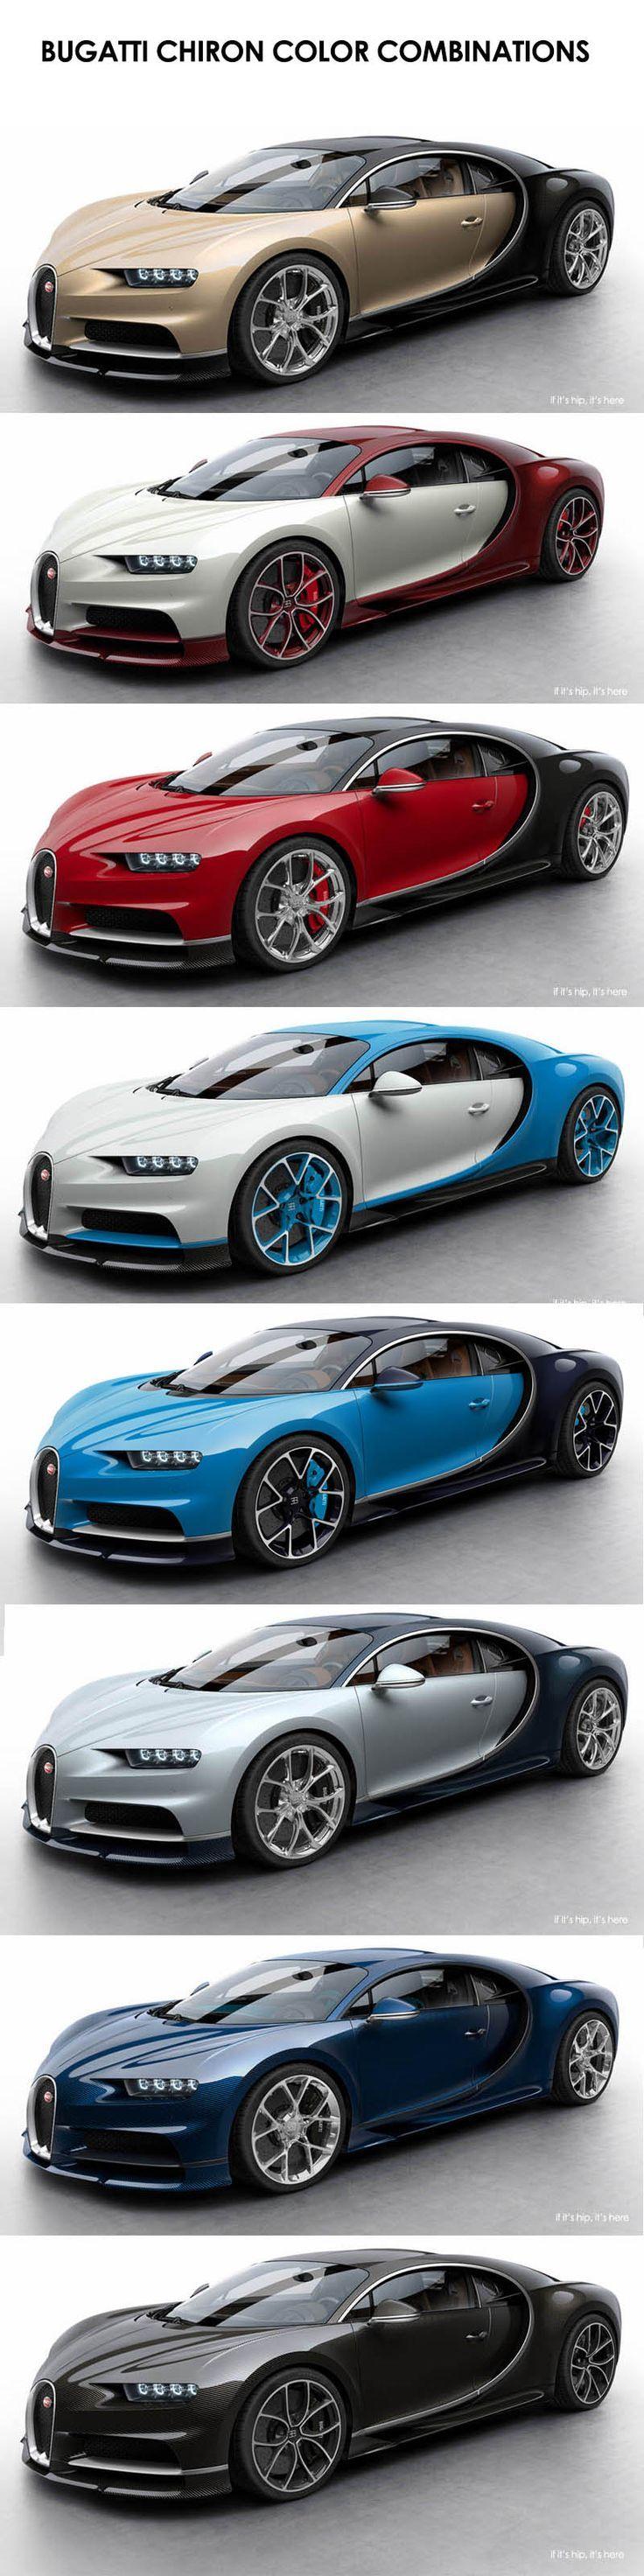 8944caeee27d5d7a6535bcd98b7580db Extraordinary Bugatti Veyron Price In Bangladesh Cars Trend